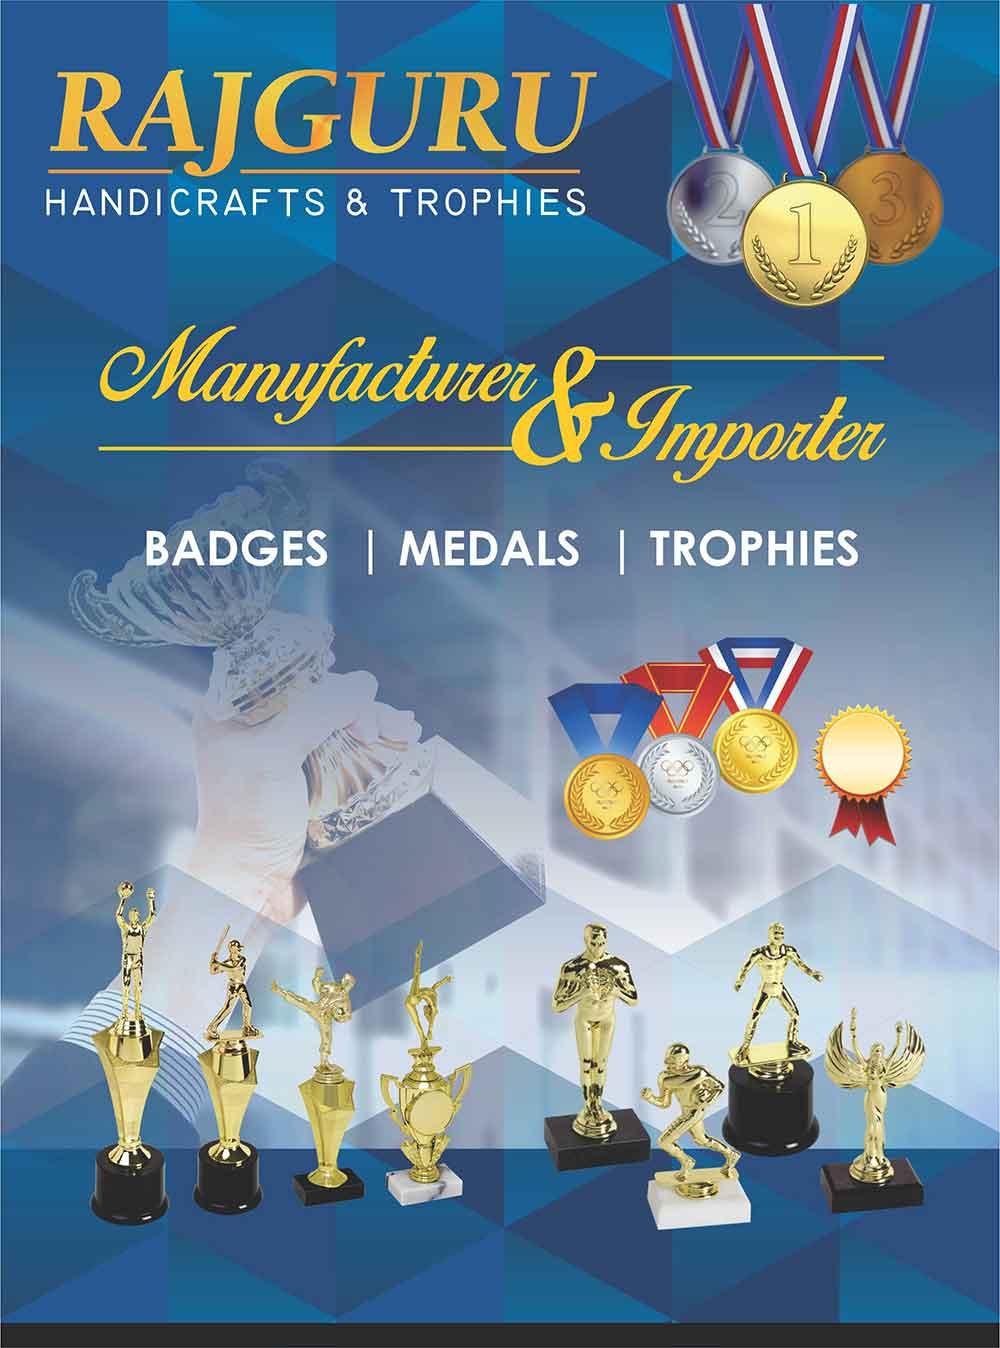 RAJGURU HANDICRAFTS AND TROPHIES